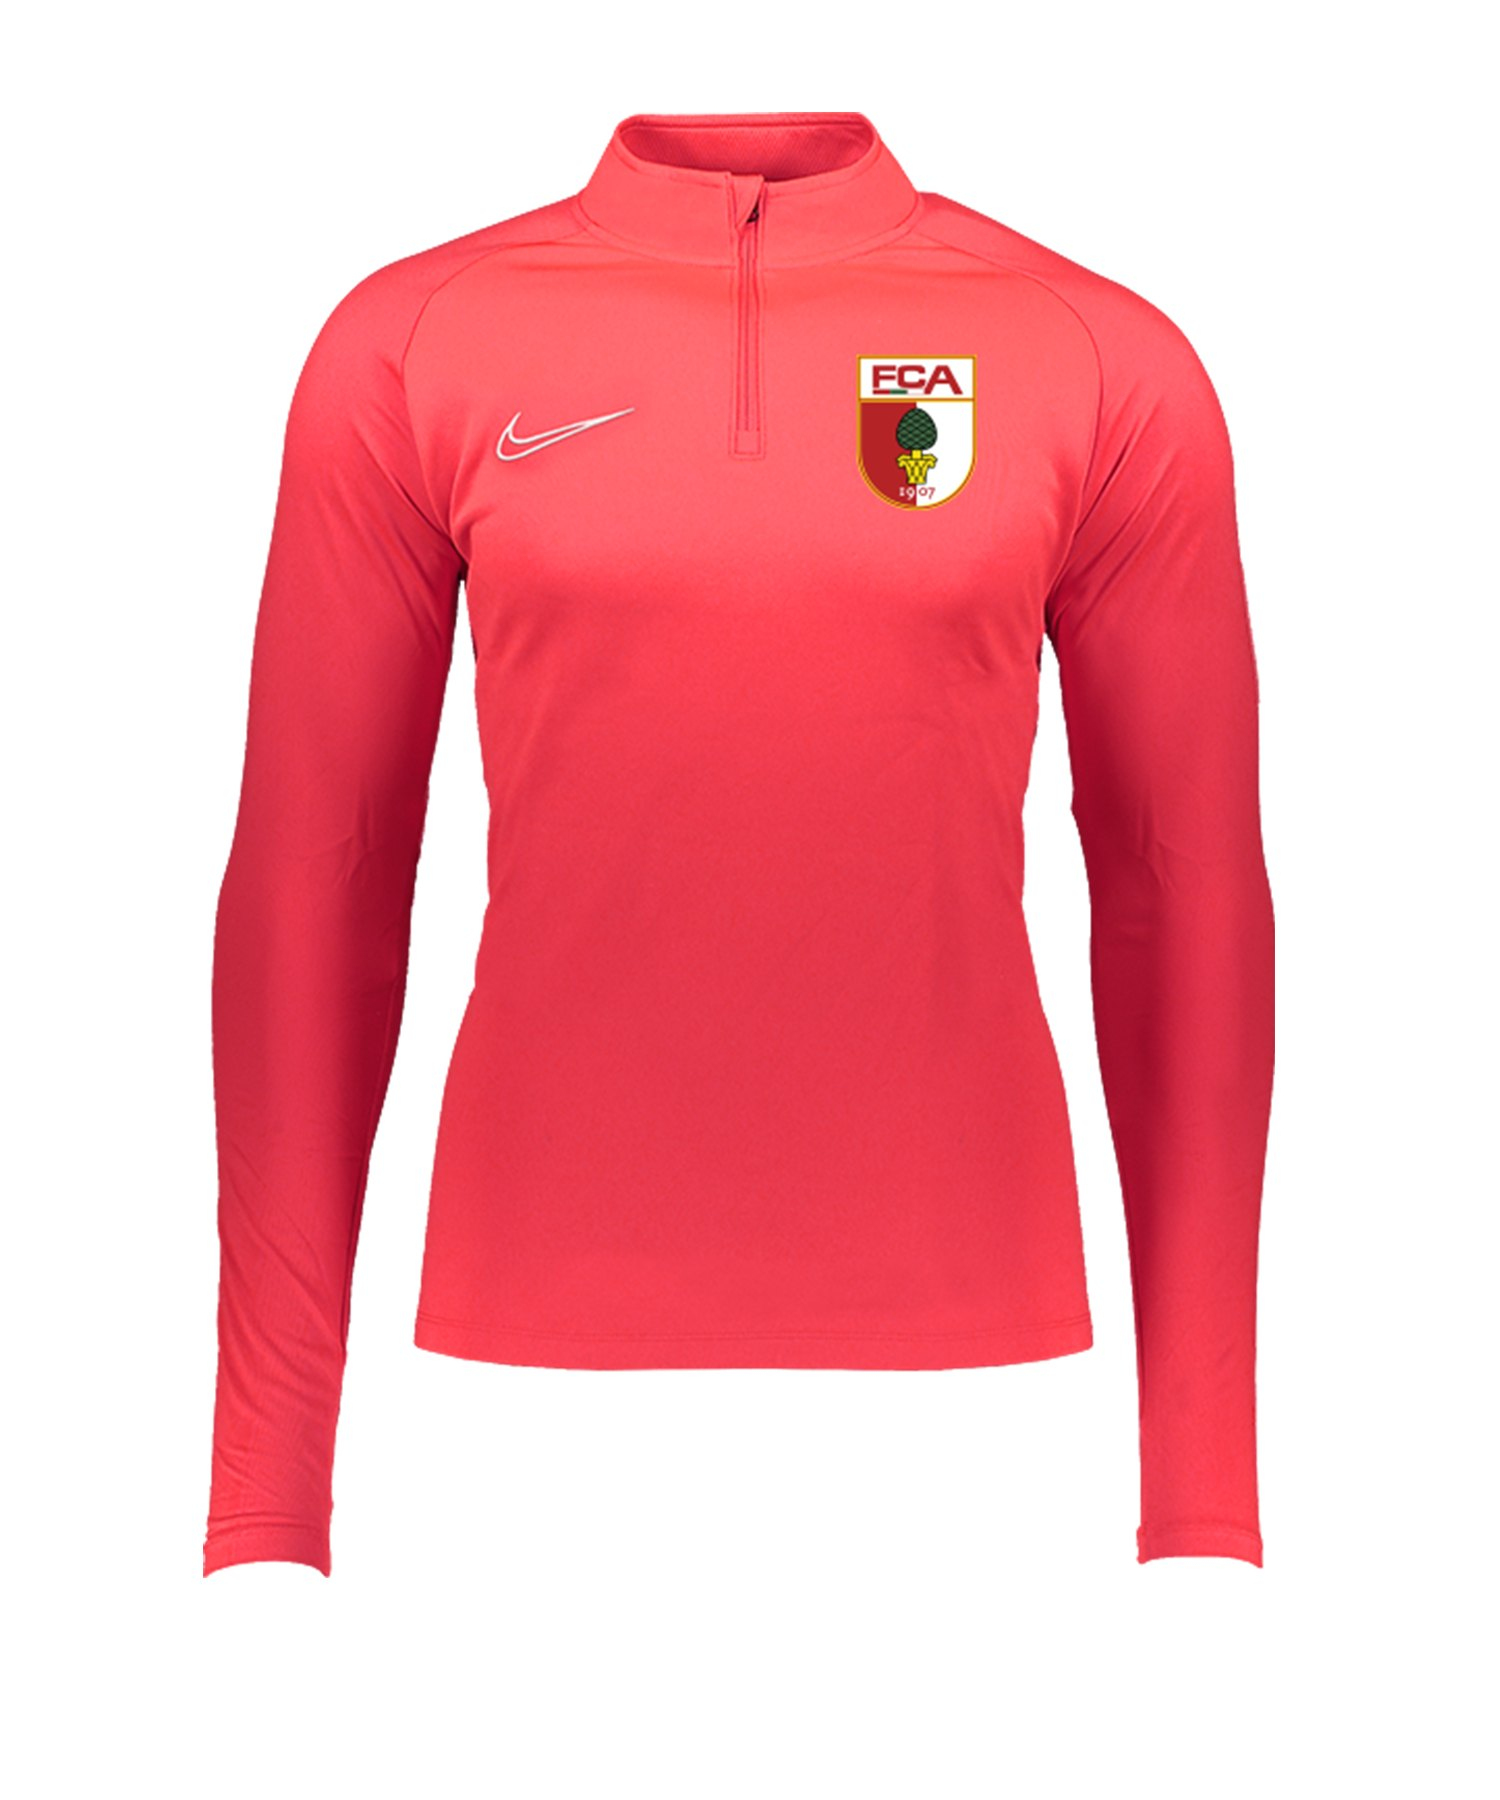 Nike FC Augsburg Trainingstop langarm Rot F671 - rot